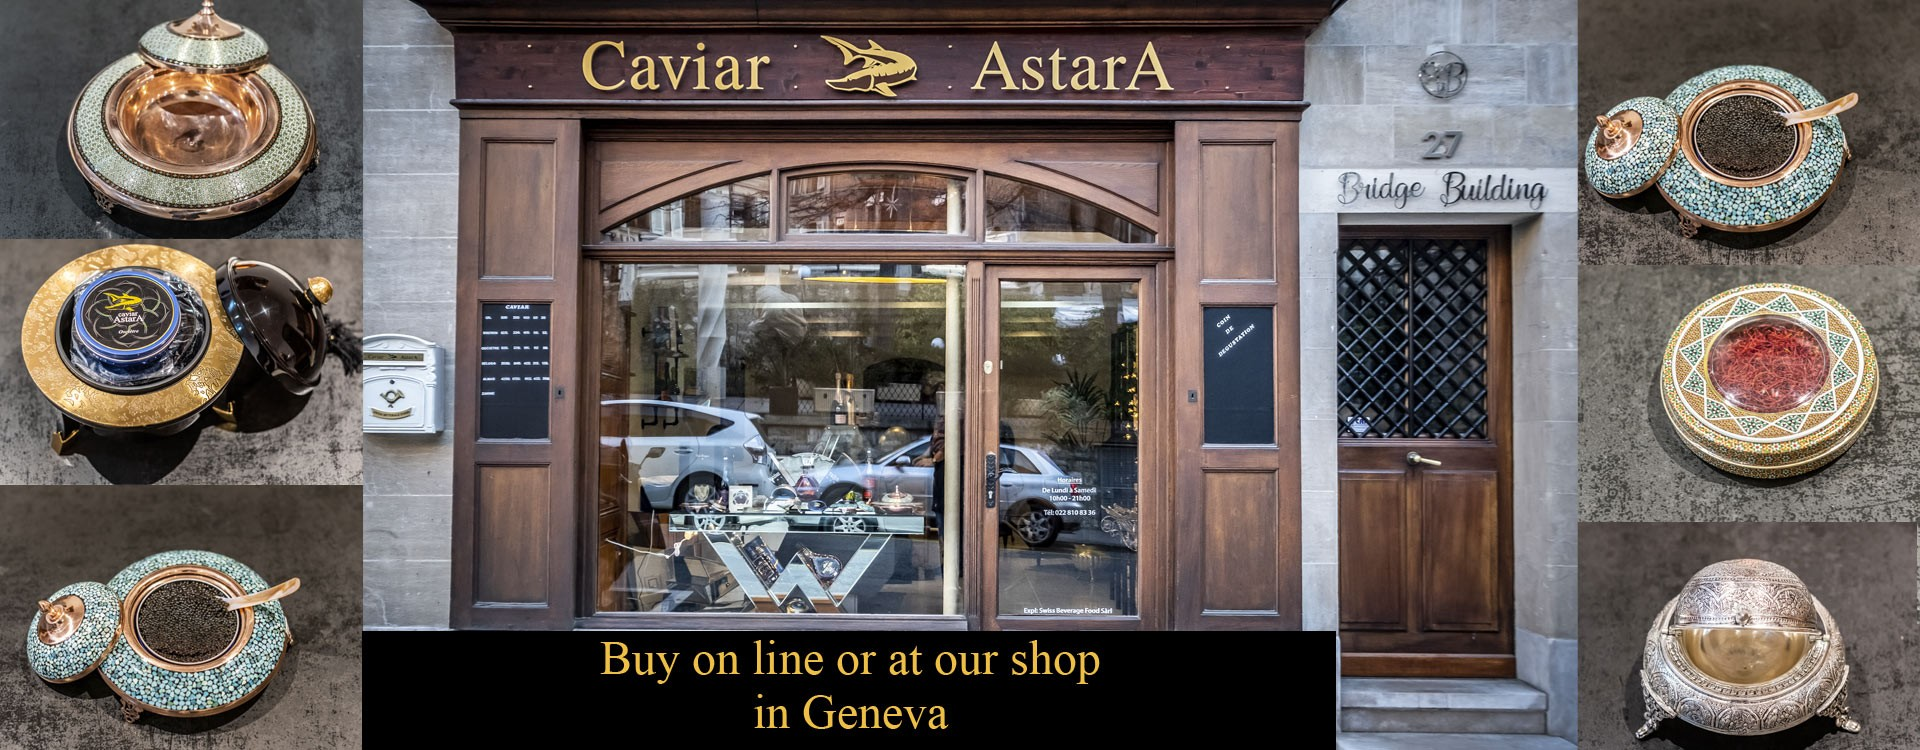 Caviar Accessories